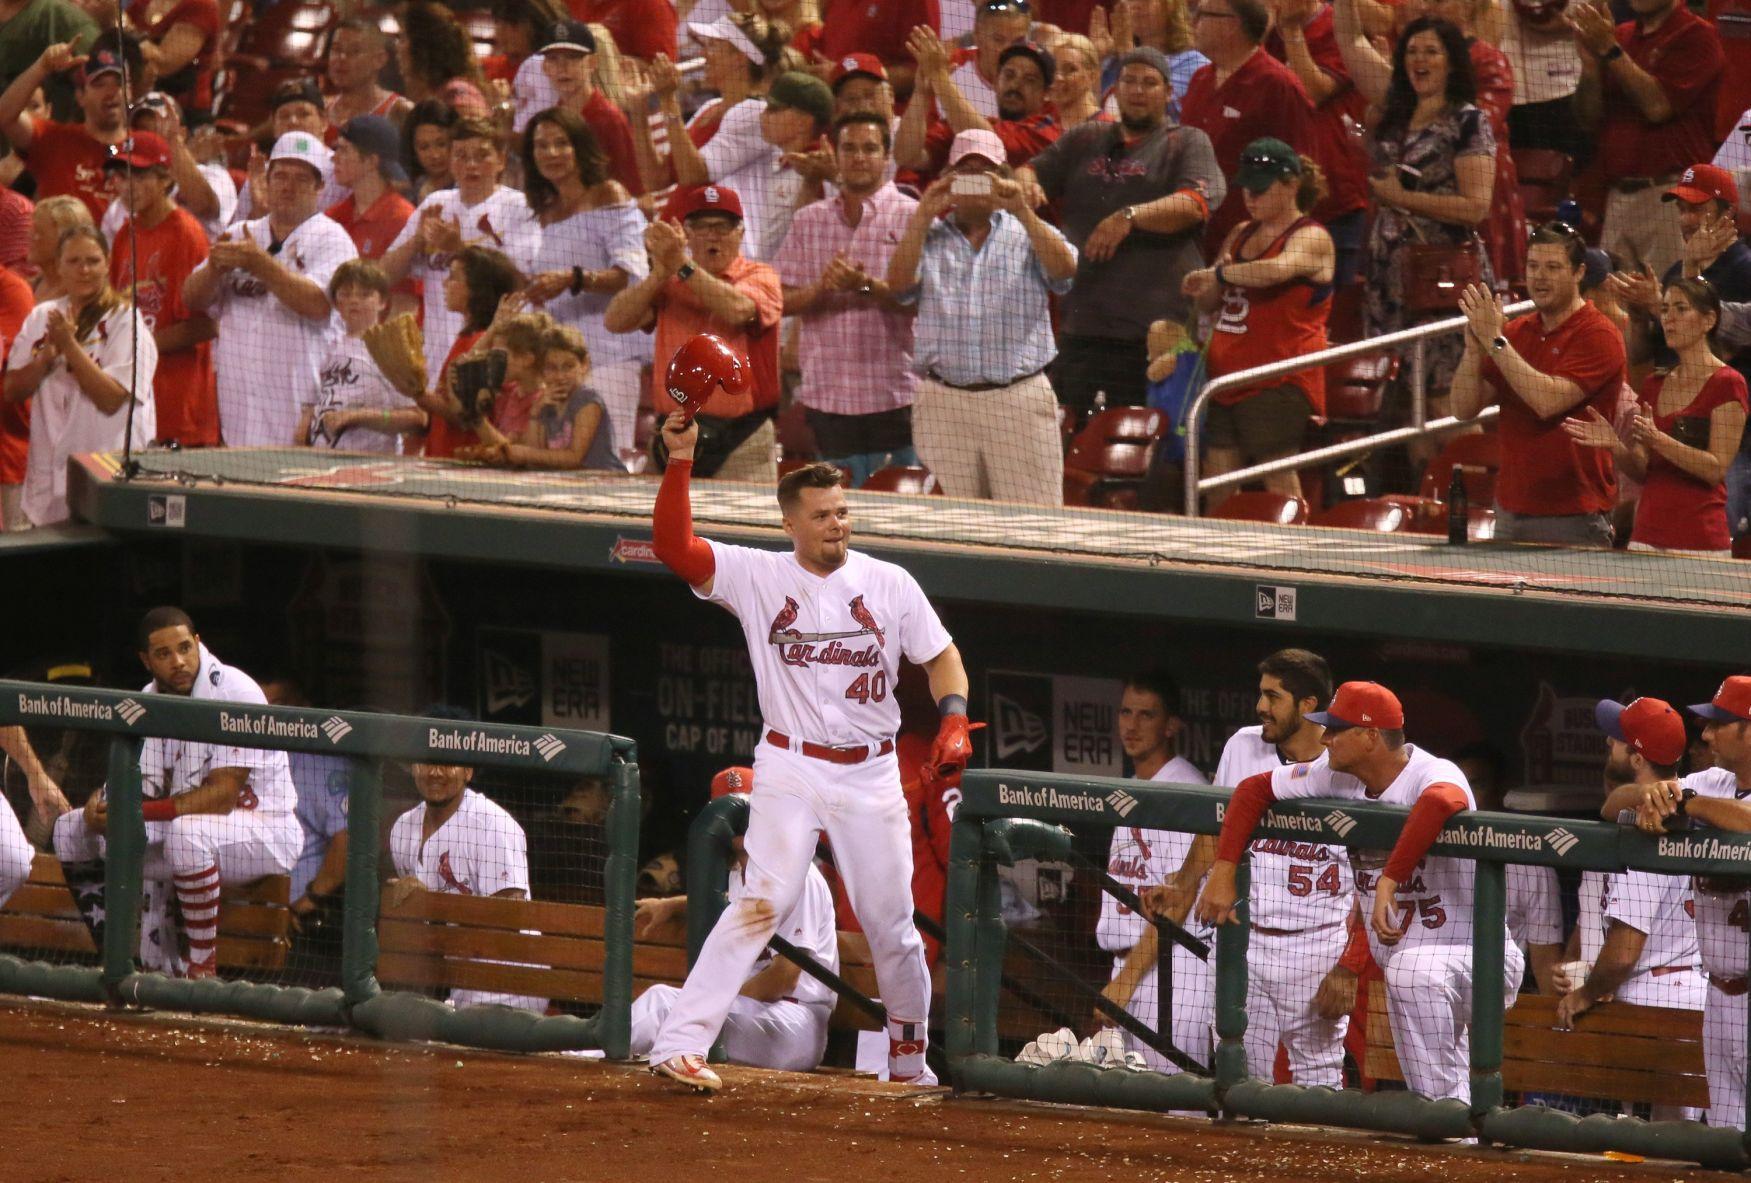 Delightful St. Louis Cardinals V Miami Marlins